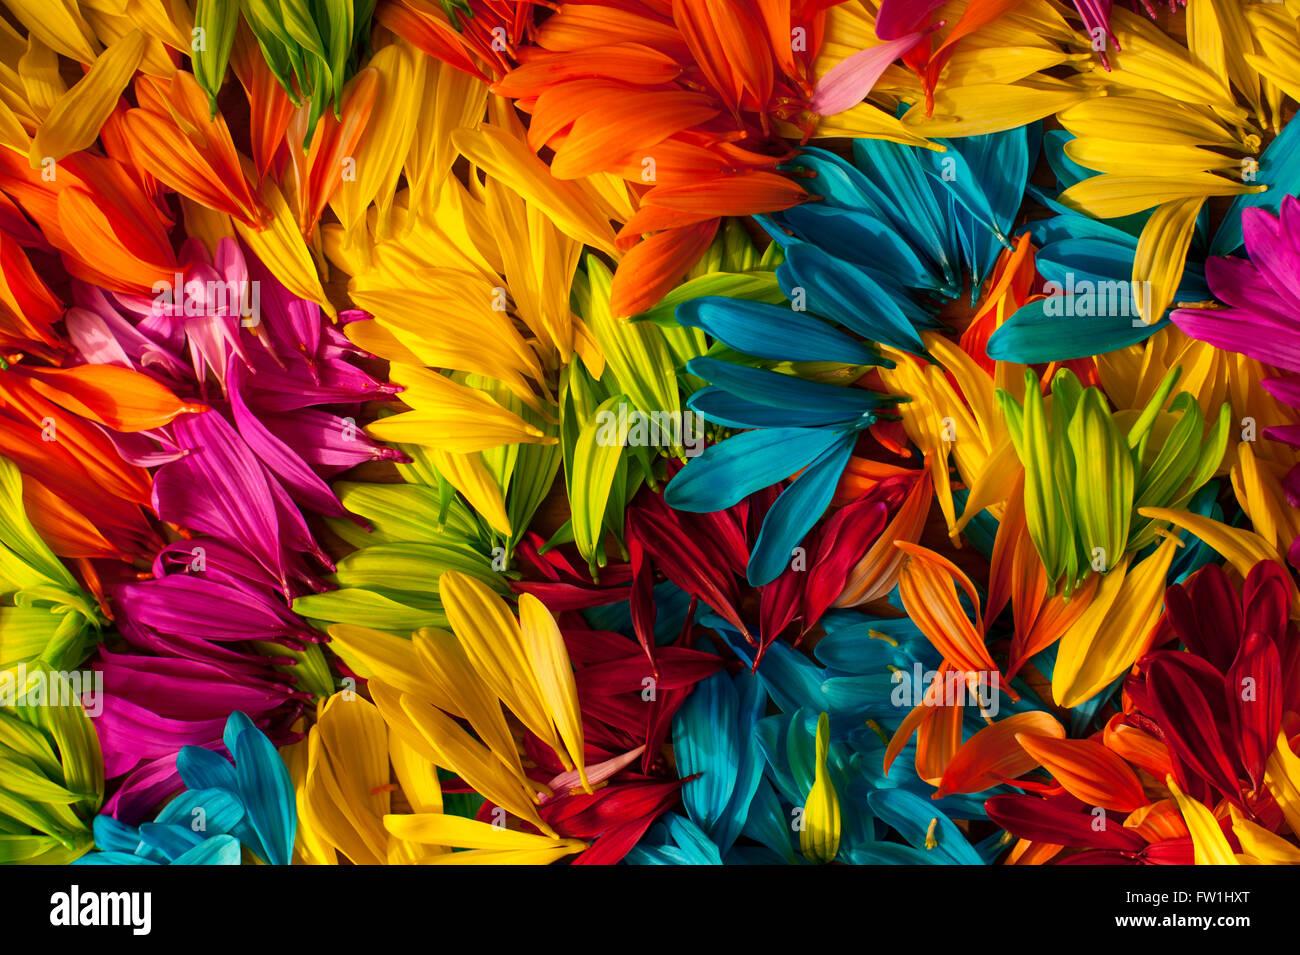 Multicolored daisy petals close-up Stock Photo